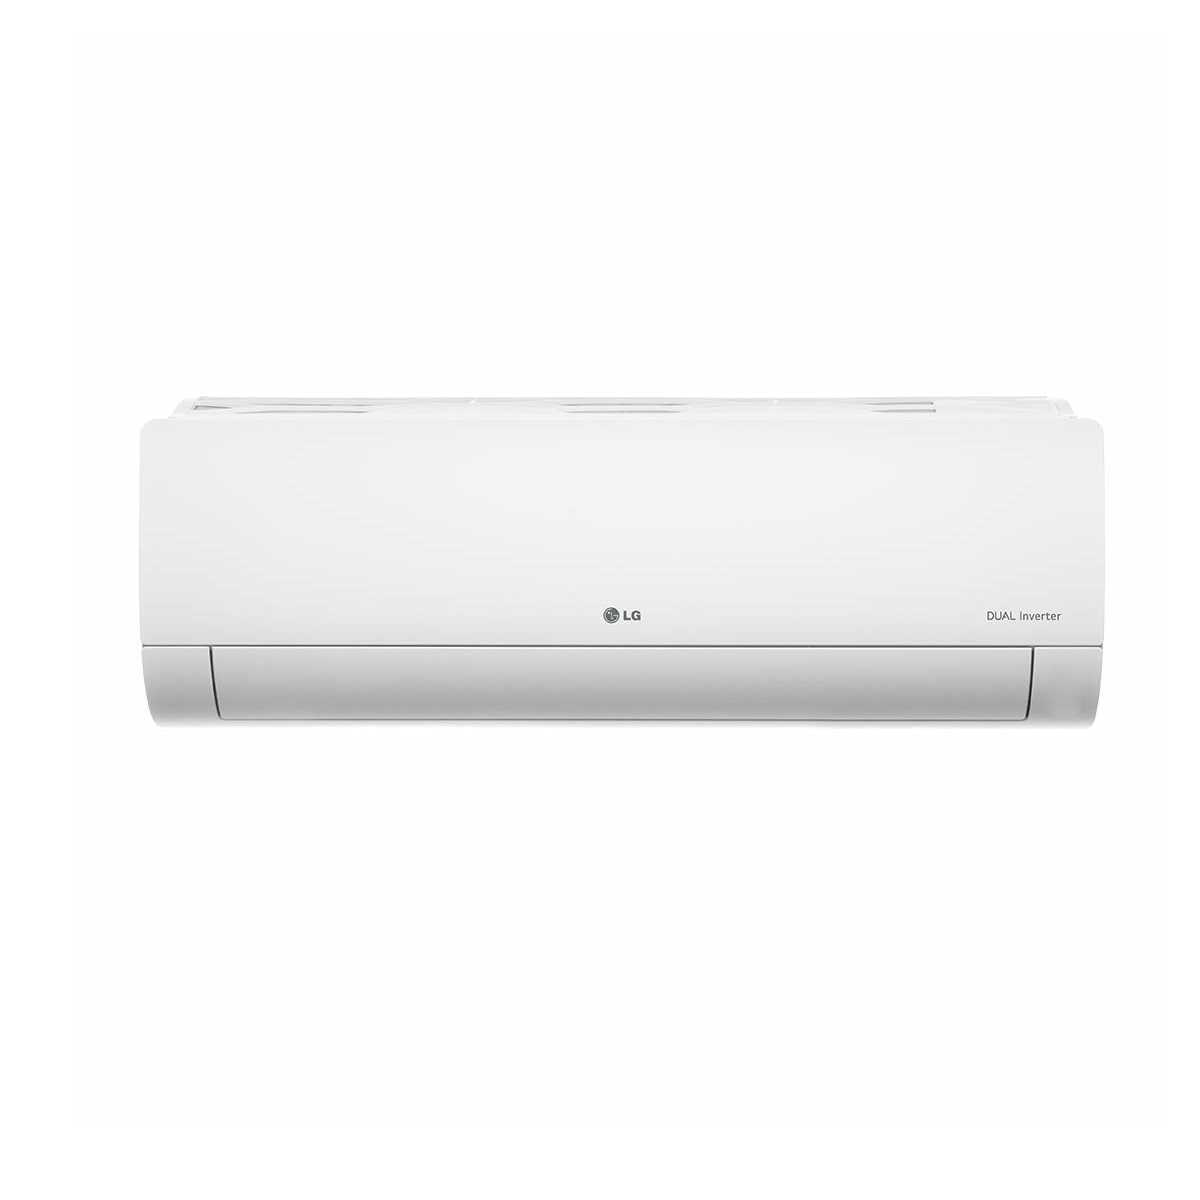 LG KS Q24ENXA 2 Ton 3 Star Inverter Split AC